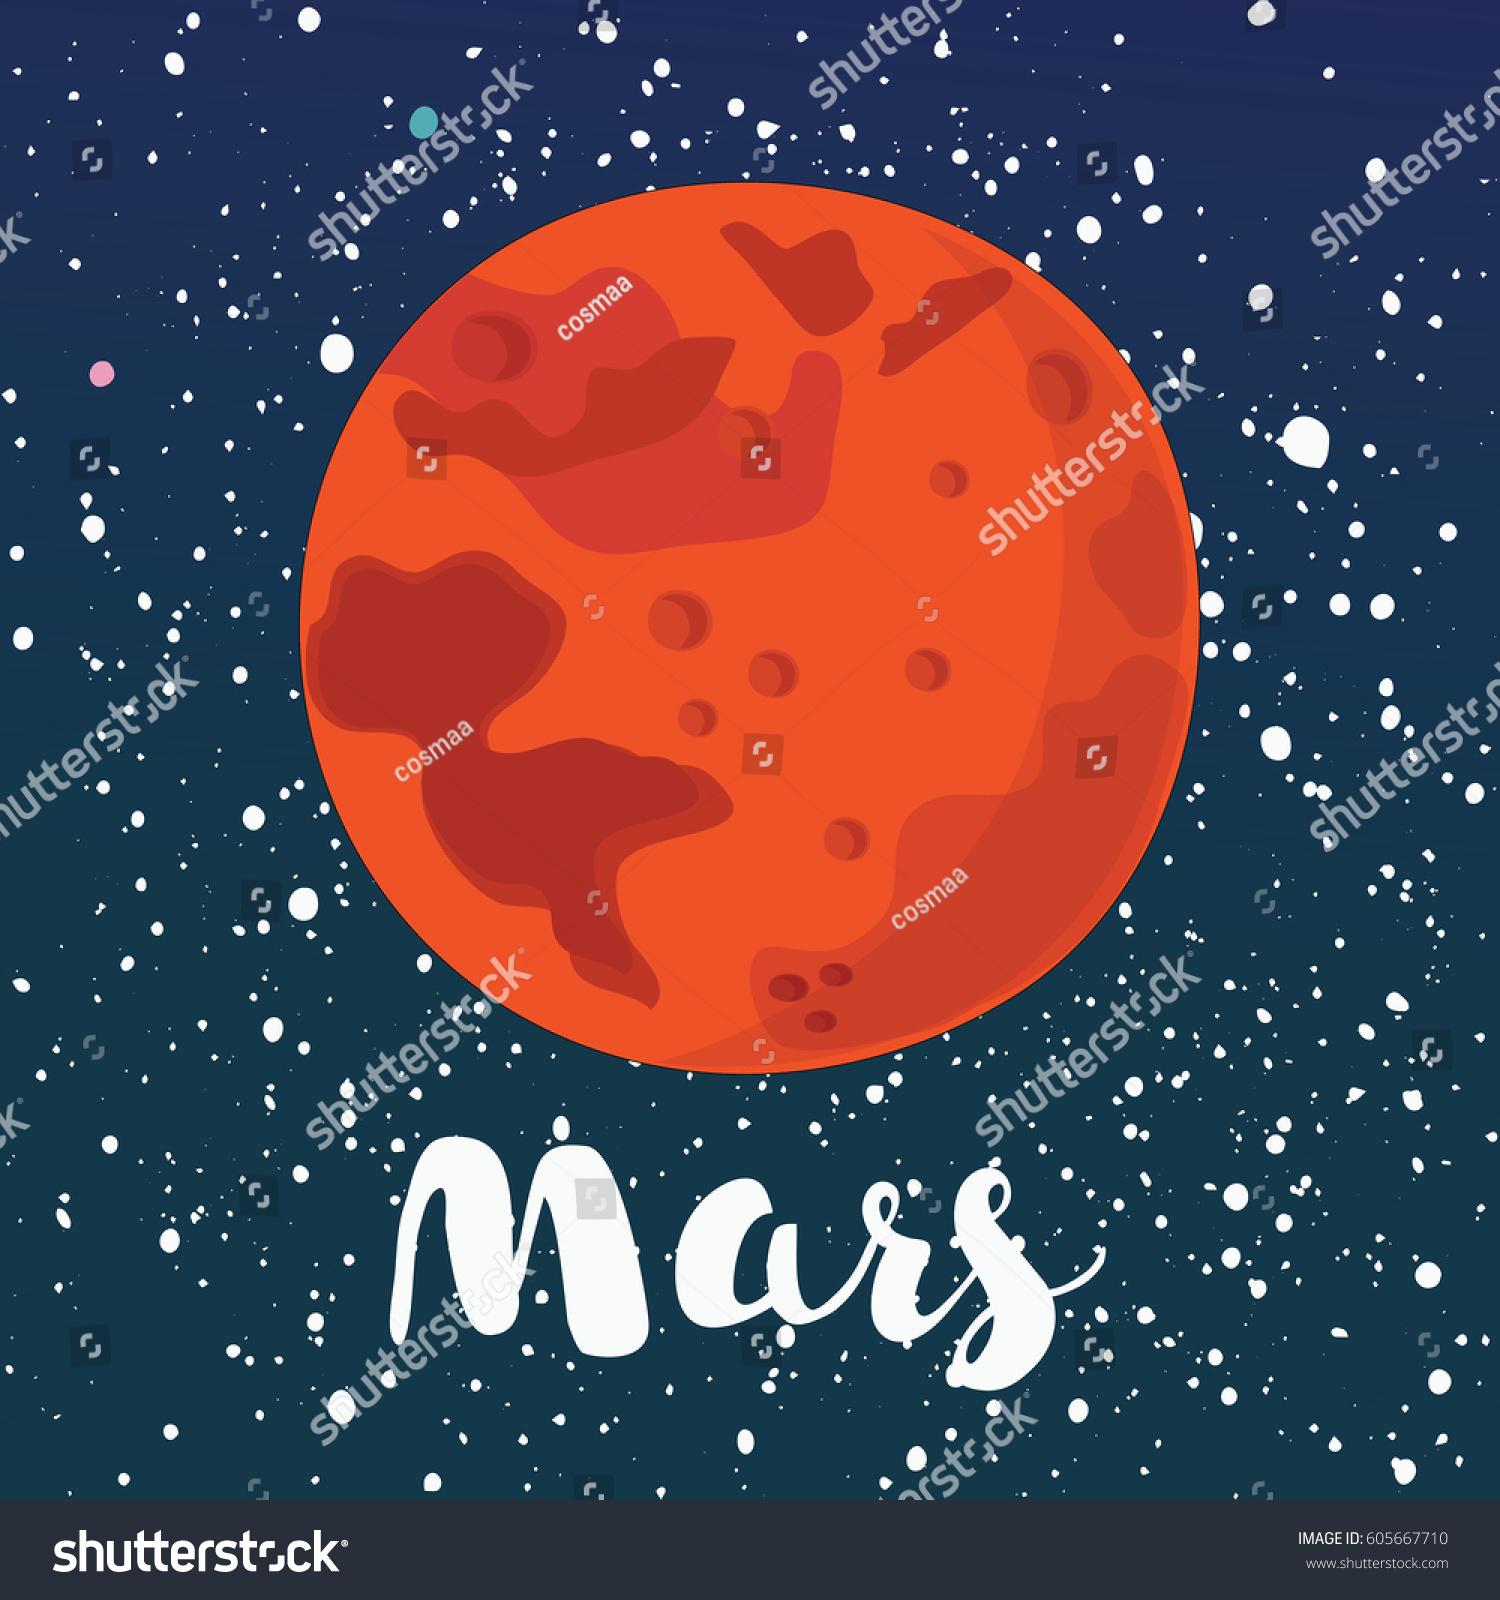 mars planet vector - photo #18